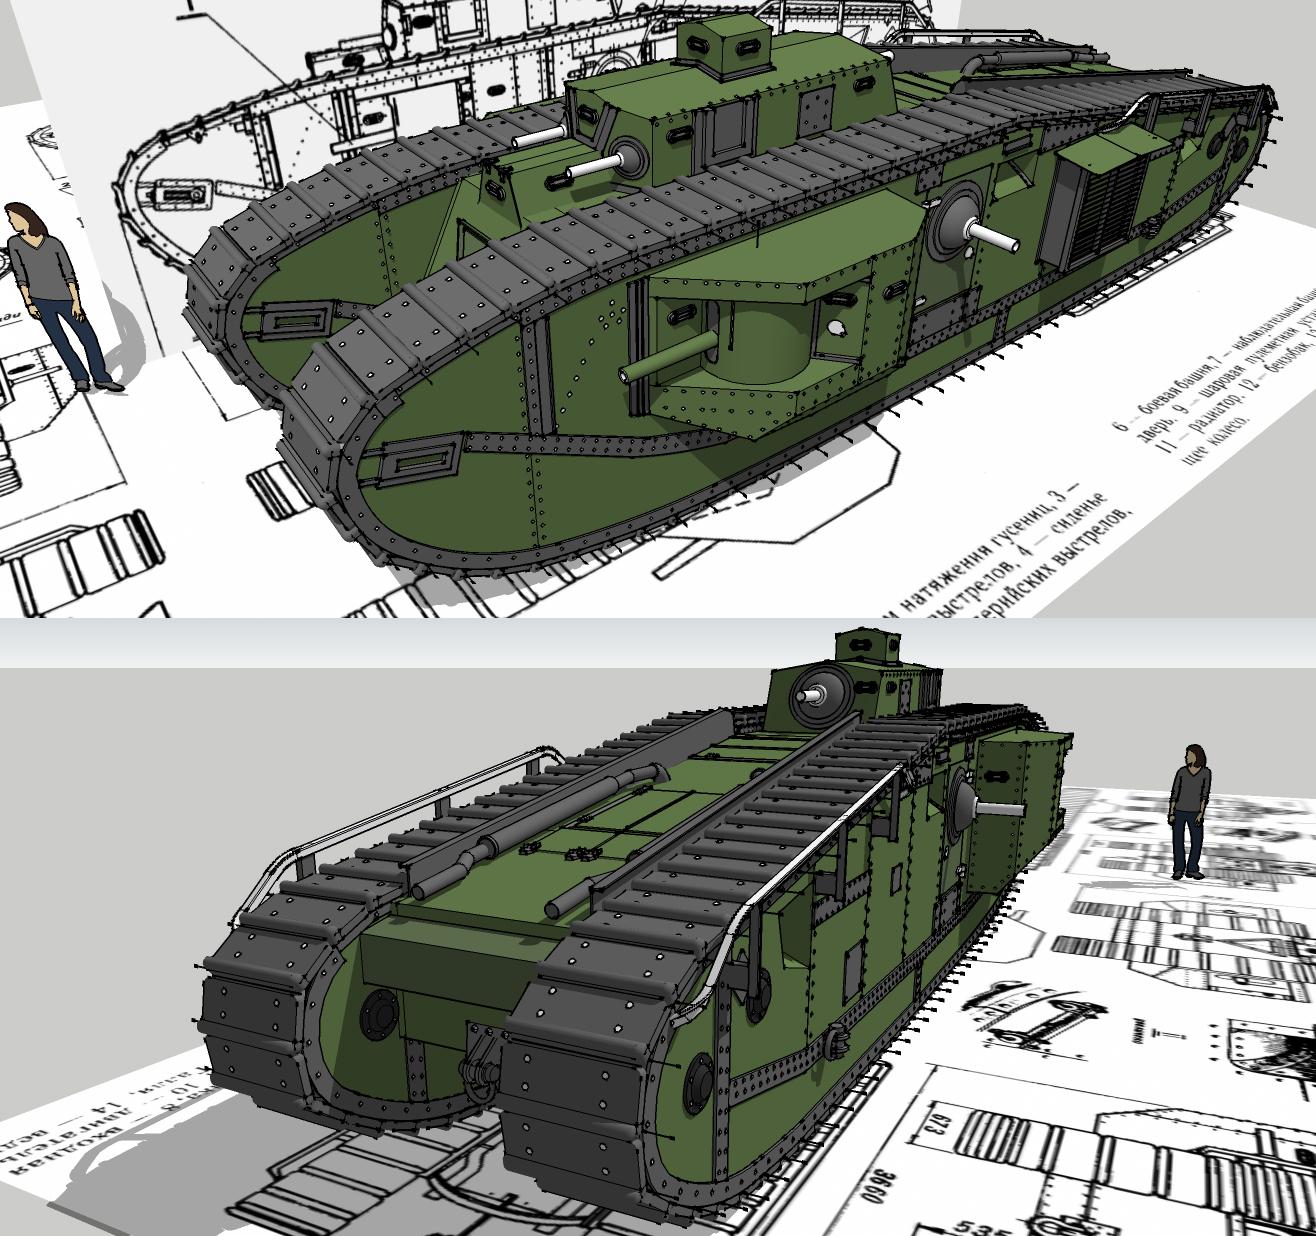 Mk. VIII liberty tank by Giganaut